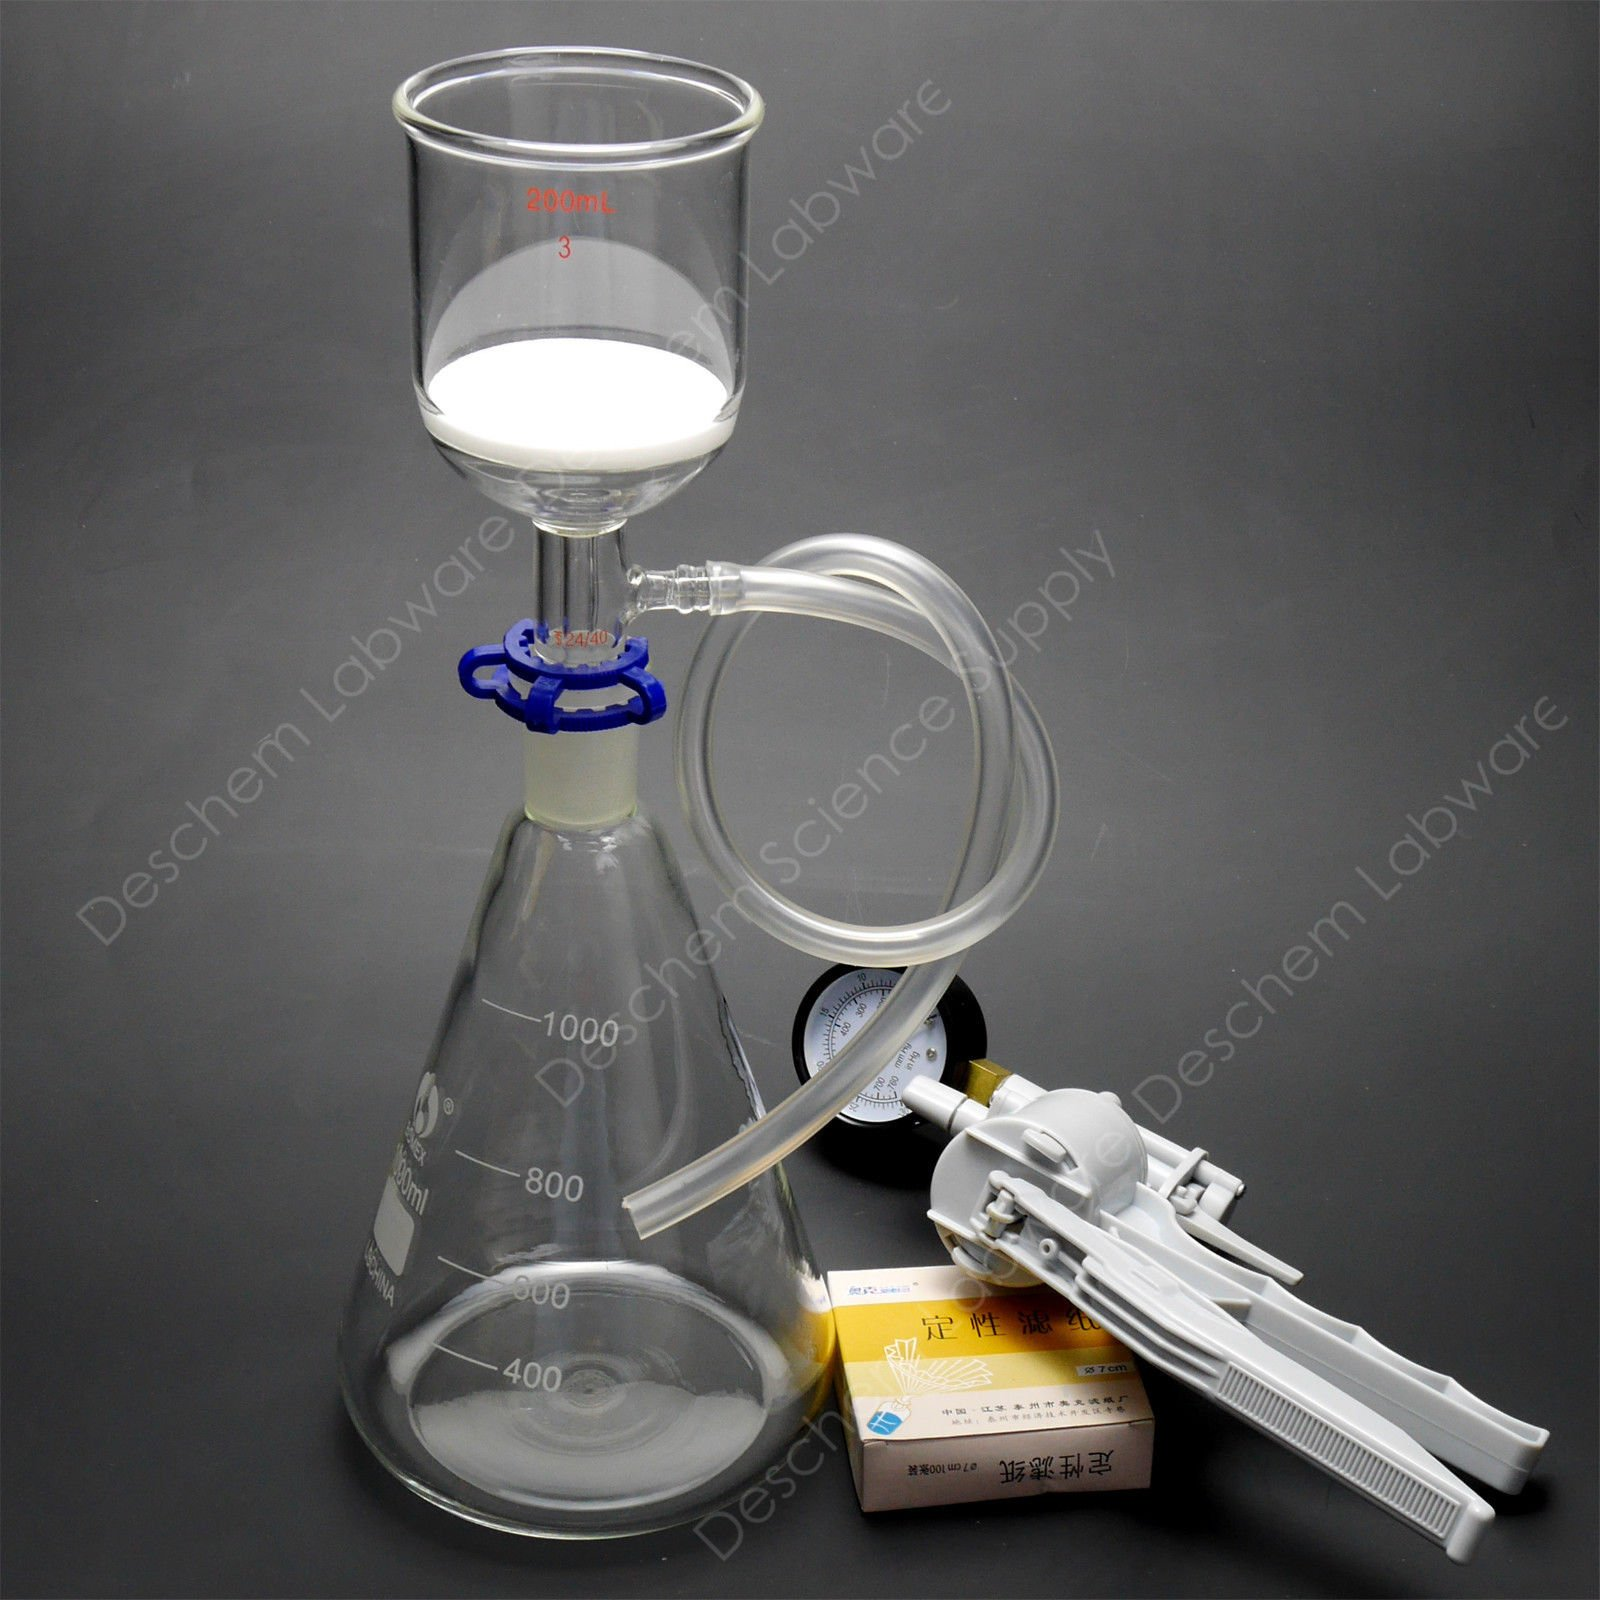 Deschem 1000ml,Lab Suction Apparatus,200ml Funnel,1L Flask,W/Vacuum Pump & Filter Paper